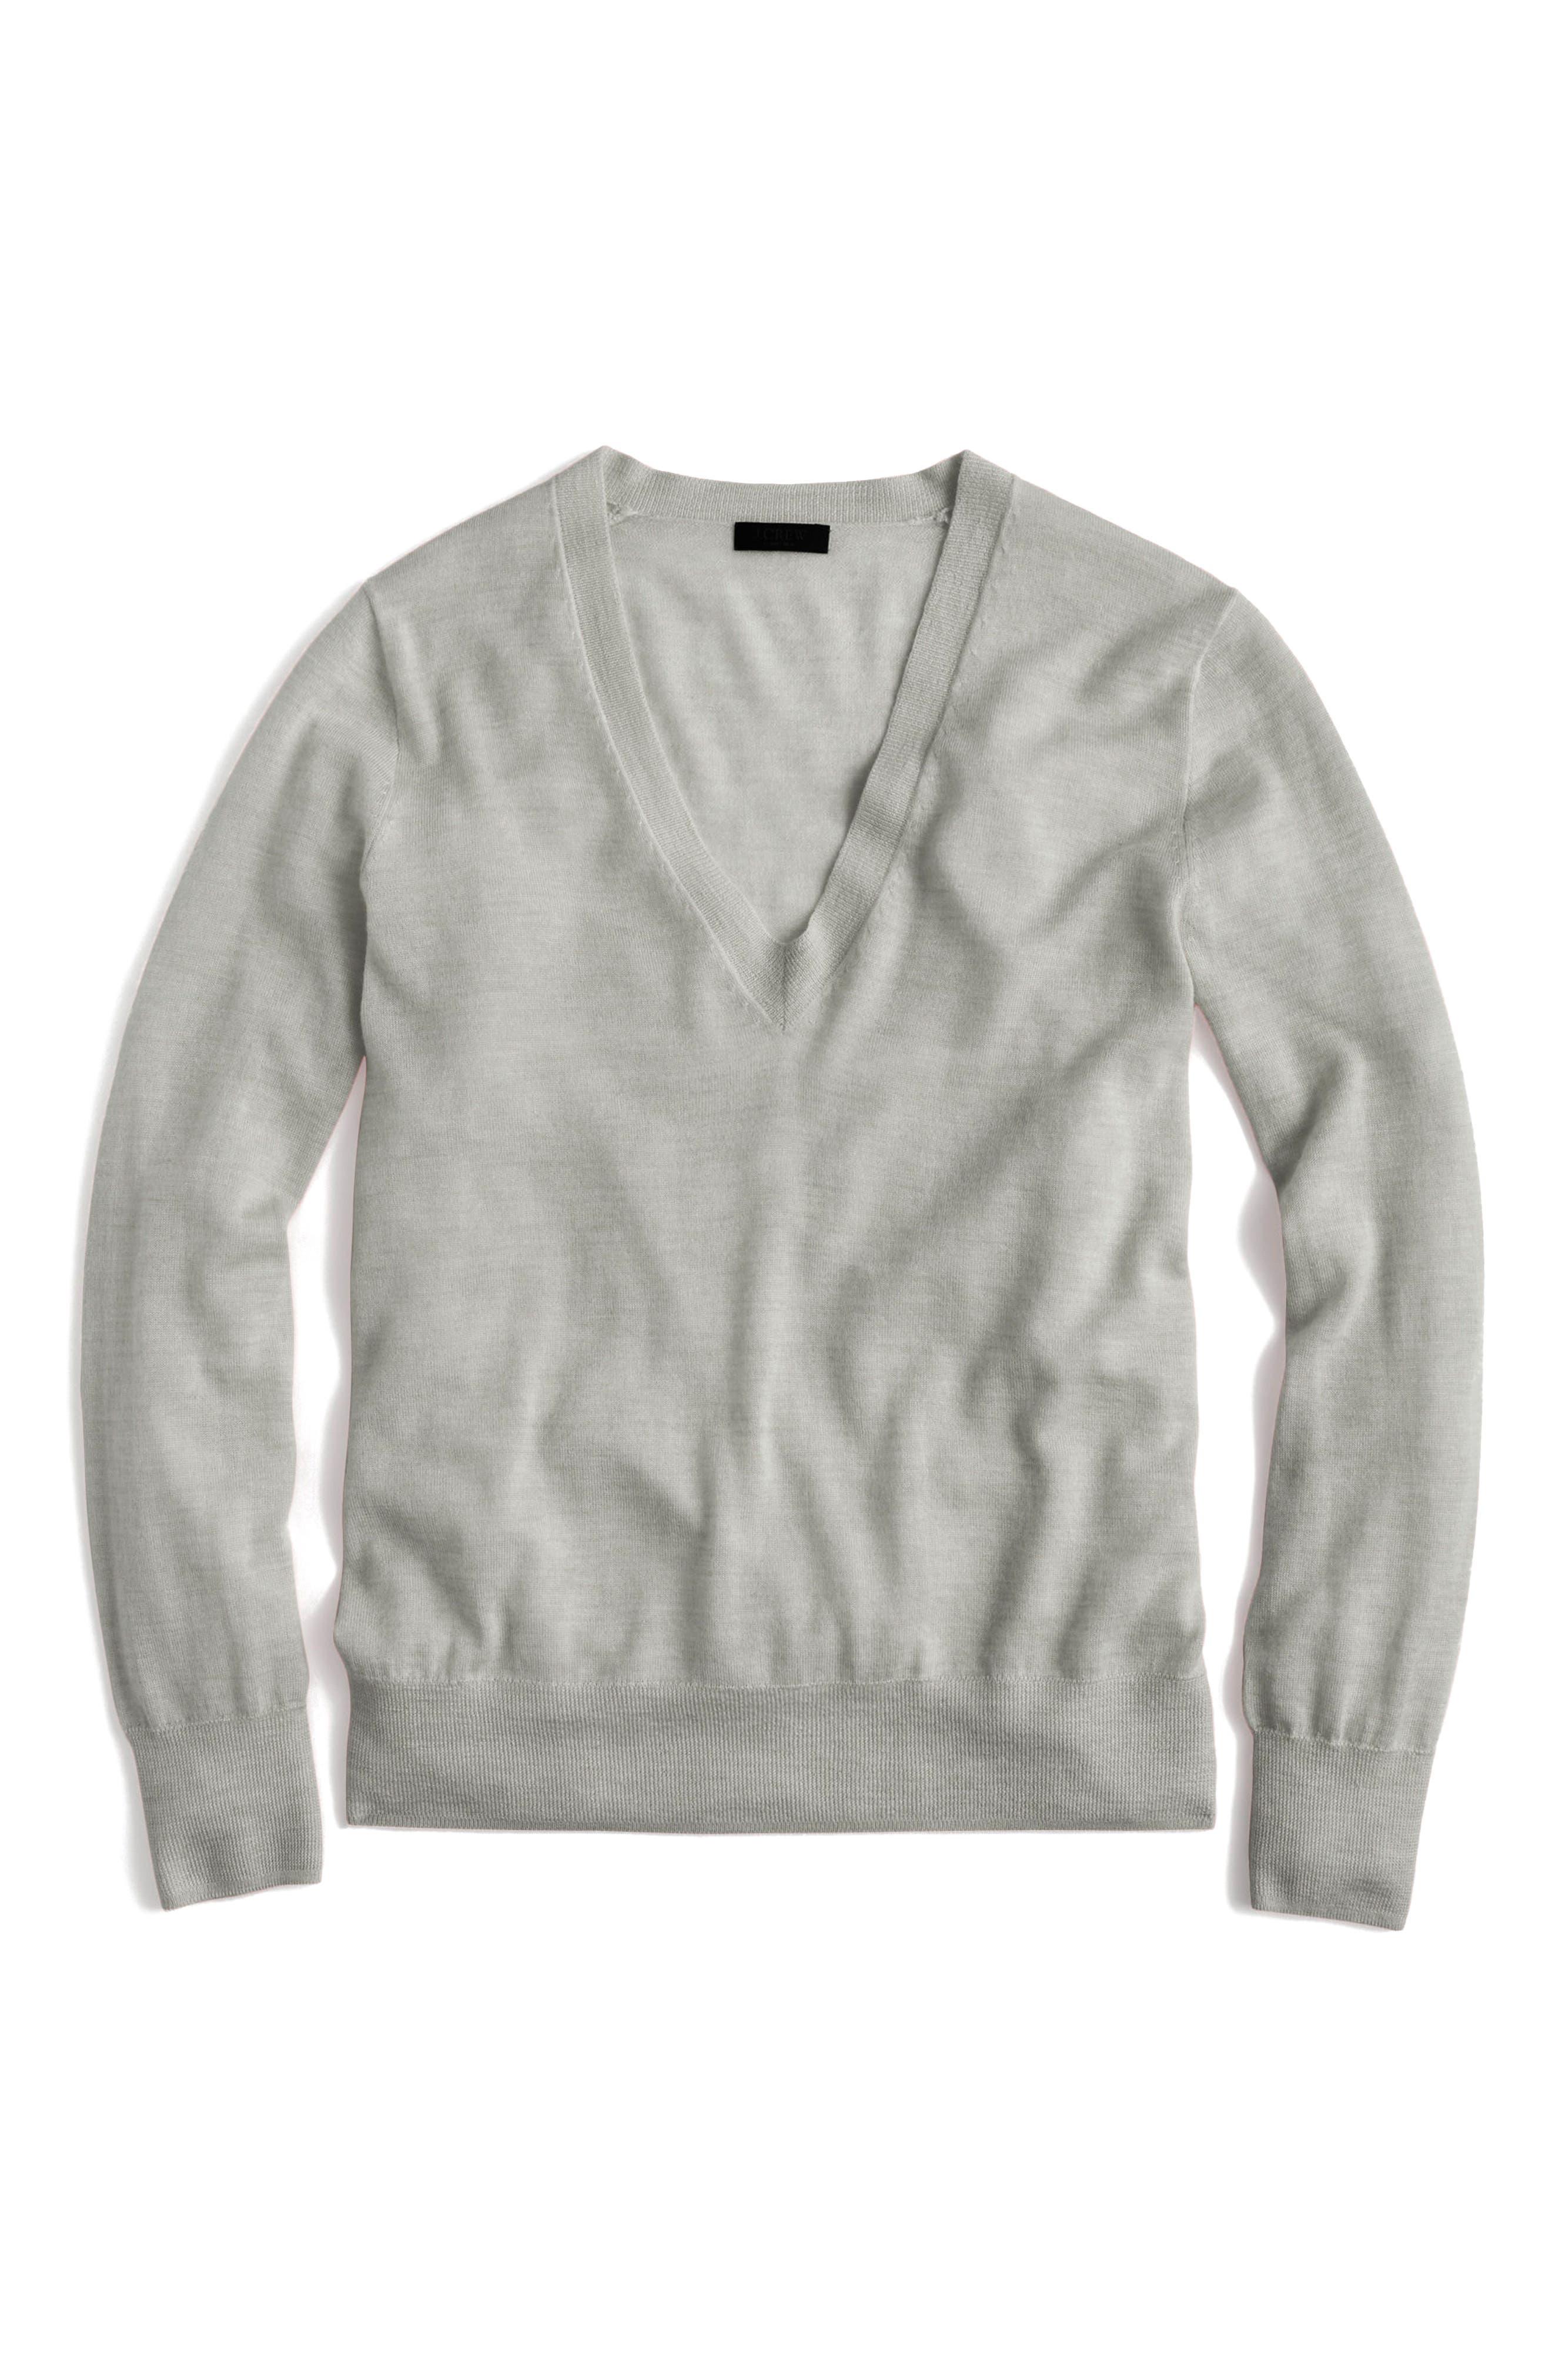 J.Crew V-Neck Italian Featherweight Cashmere Sweater